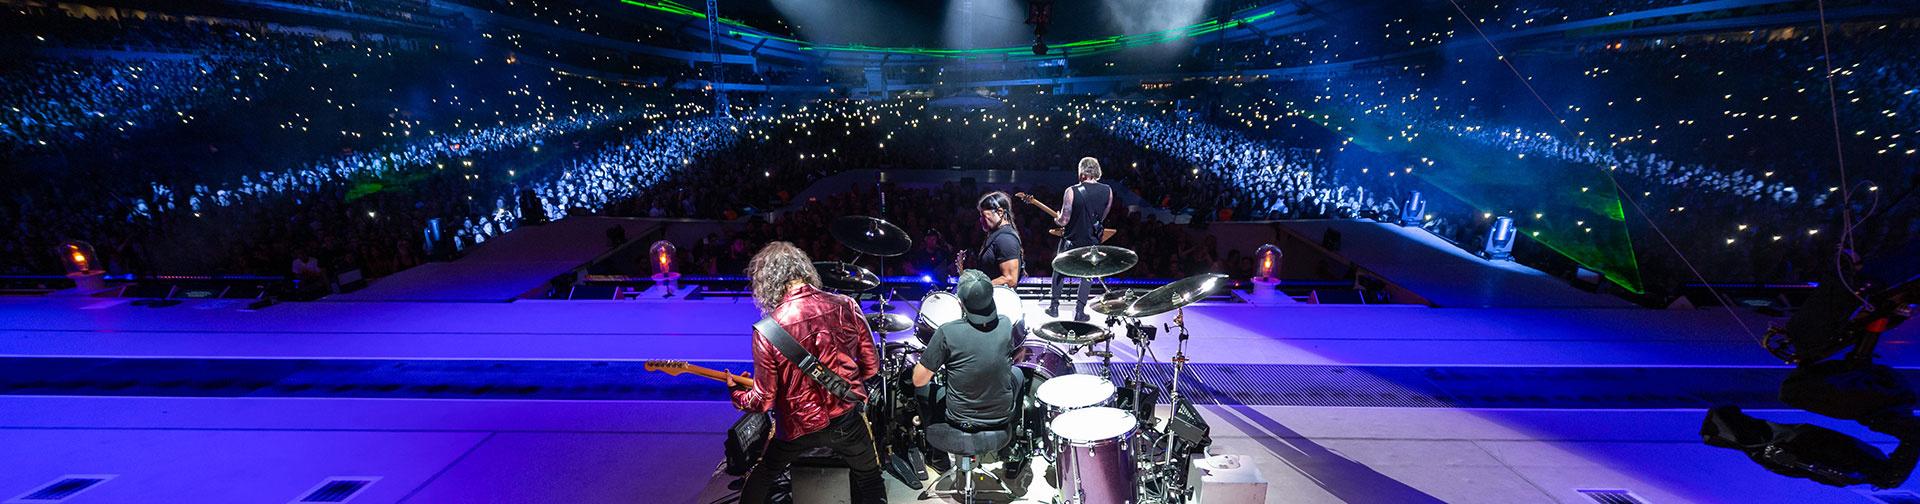 Metallica at Ullevi in Gothenburg, Sweden on July 9, 2019